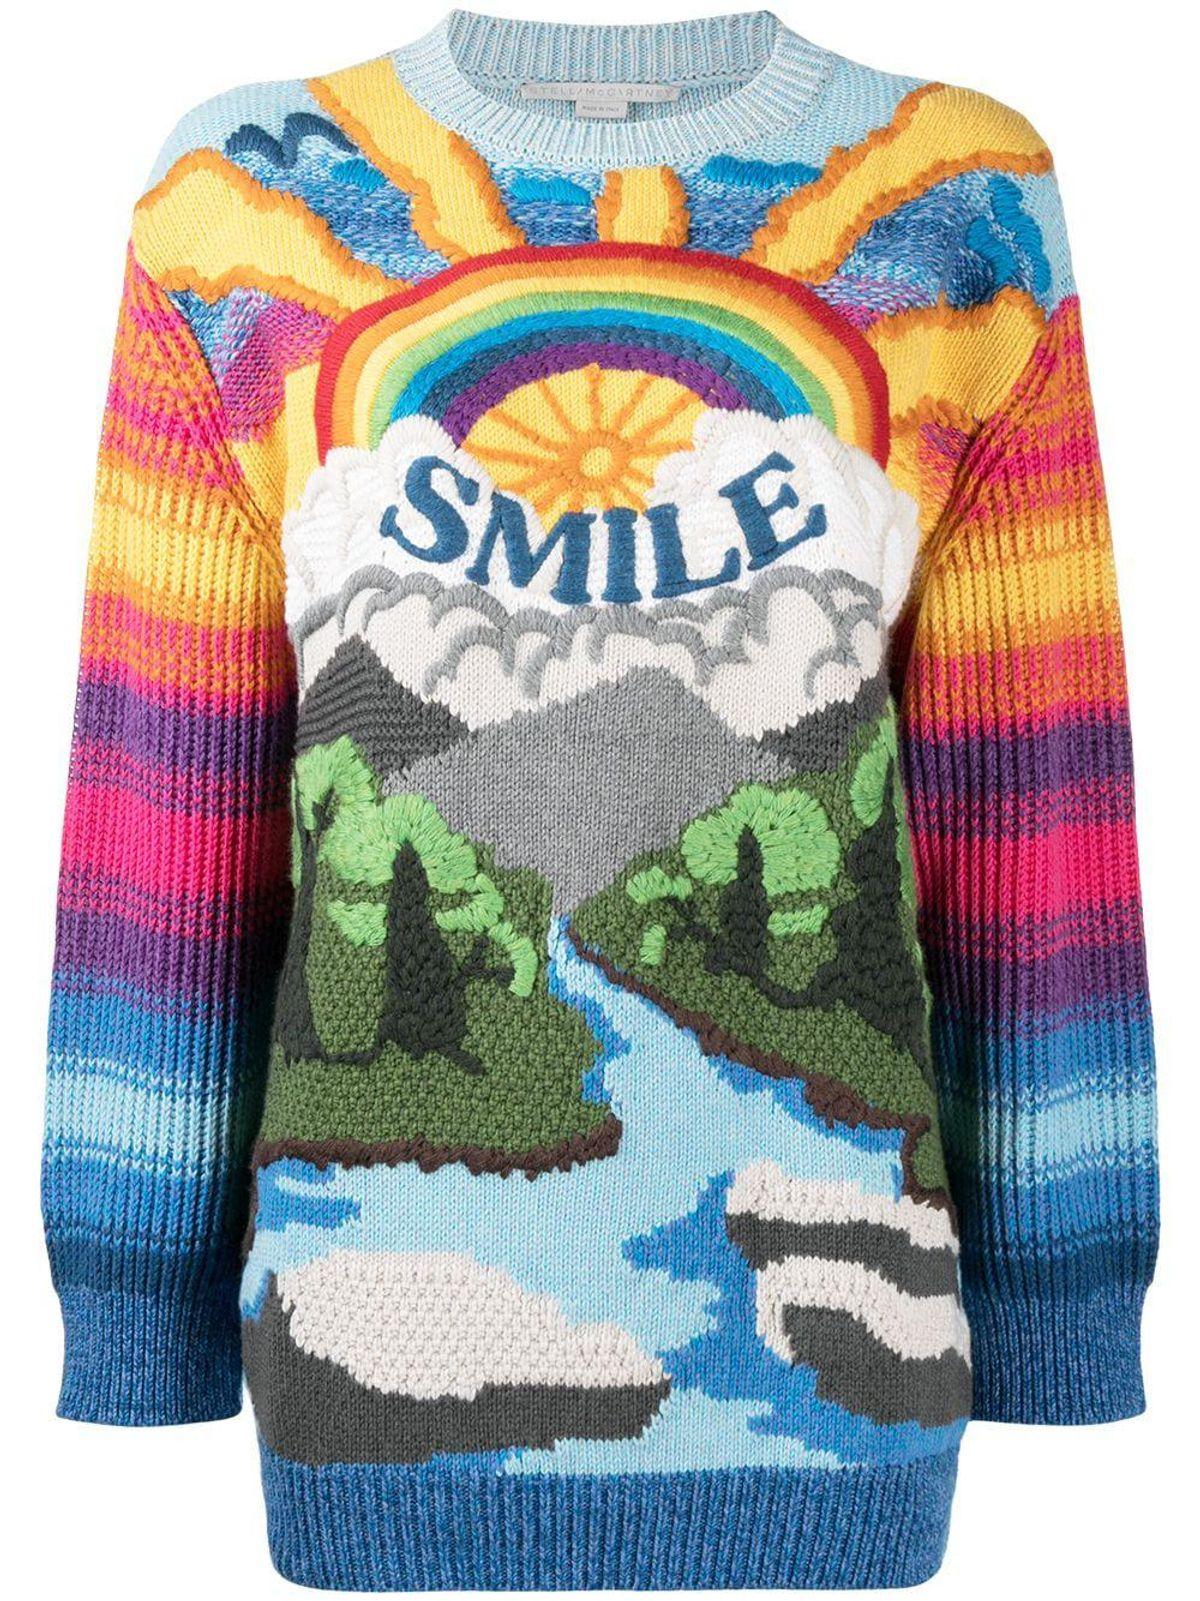 stella mccartney smile rainbow jumper